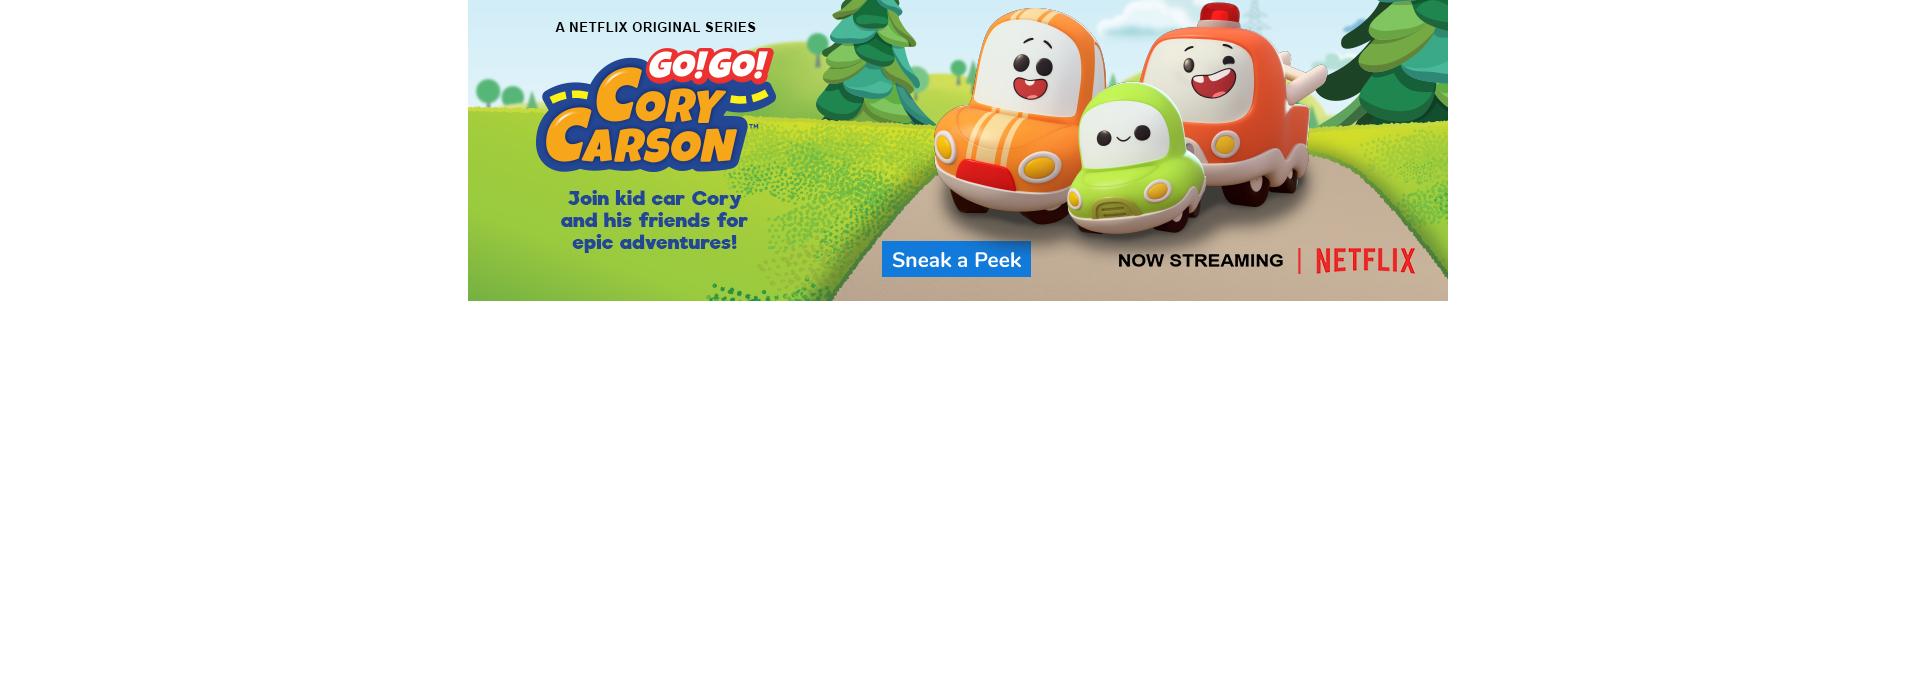 Now Streaming! The new Go! Go! Cory Carson Netflix Original Series